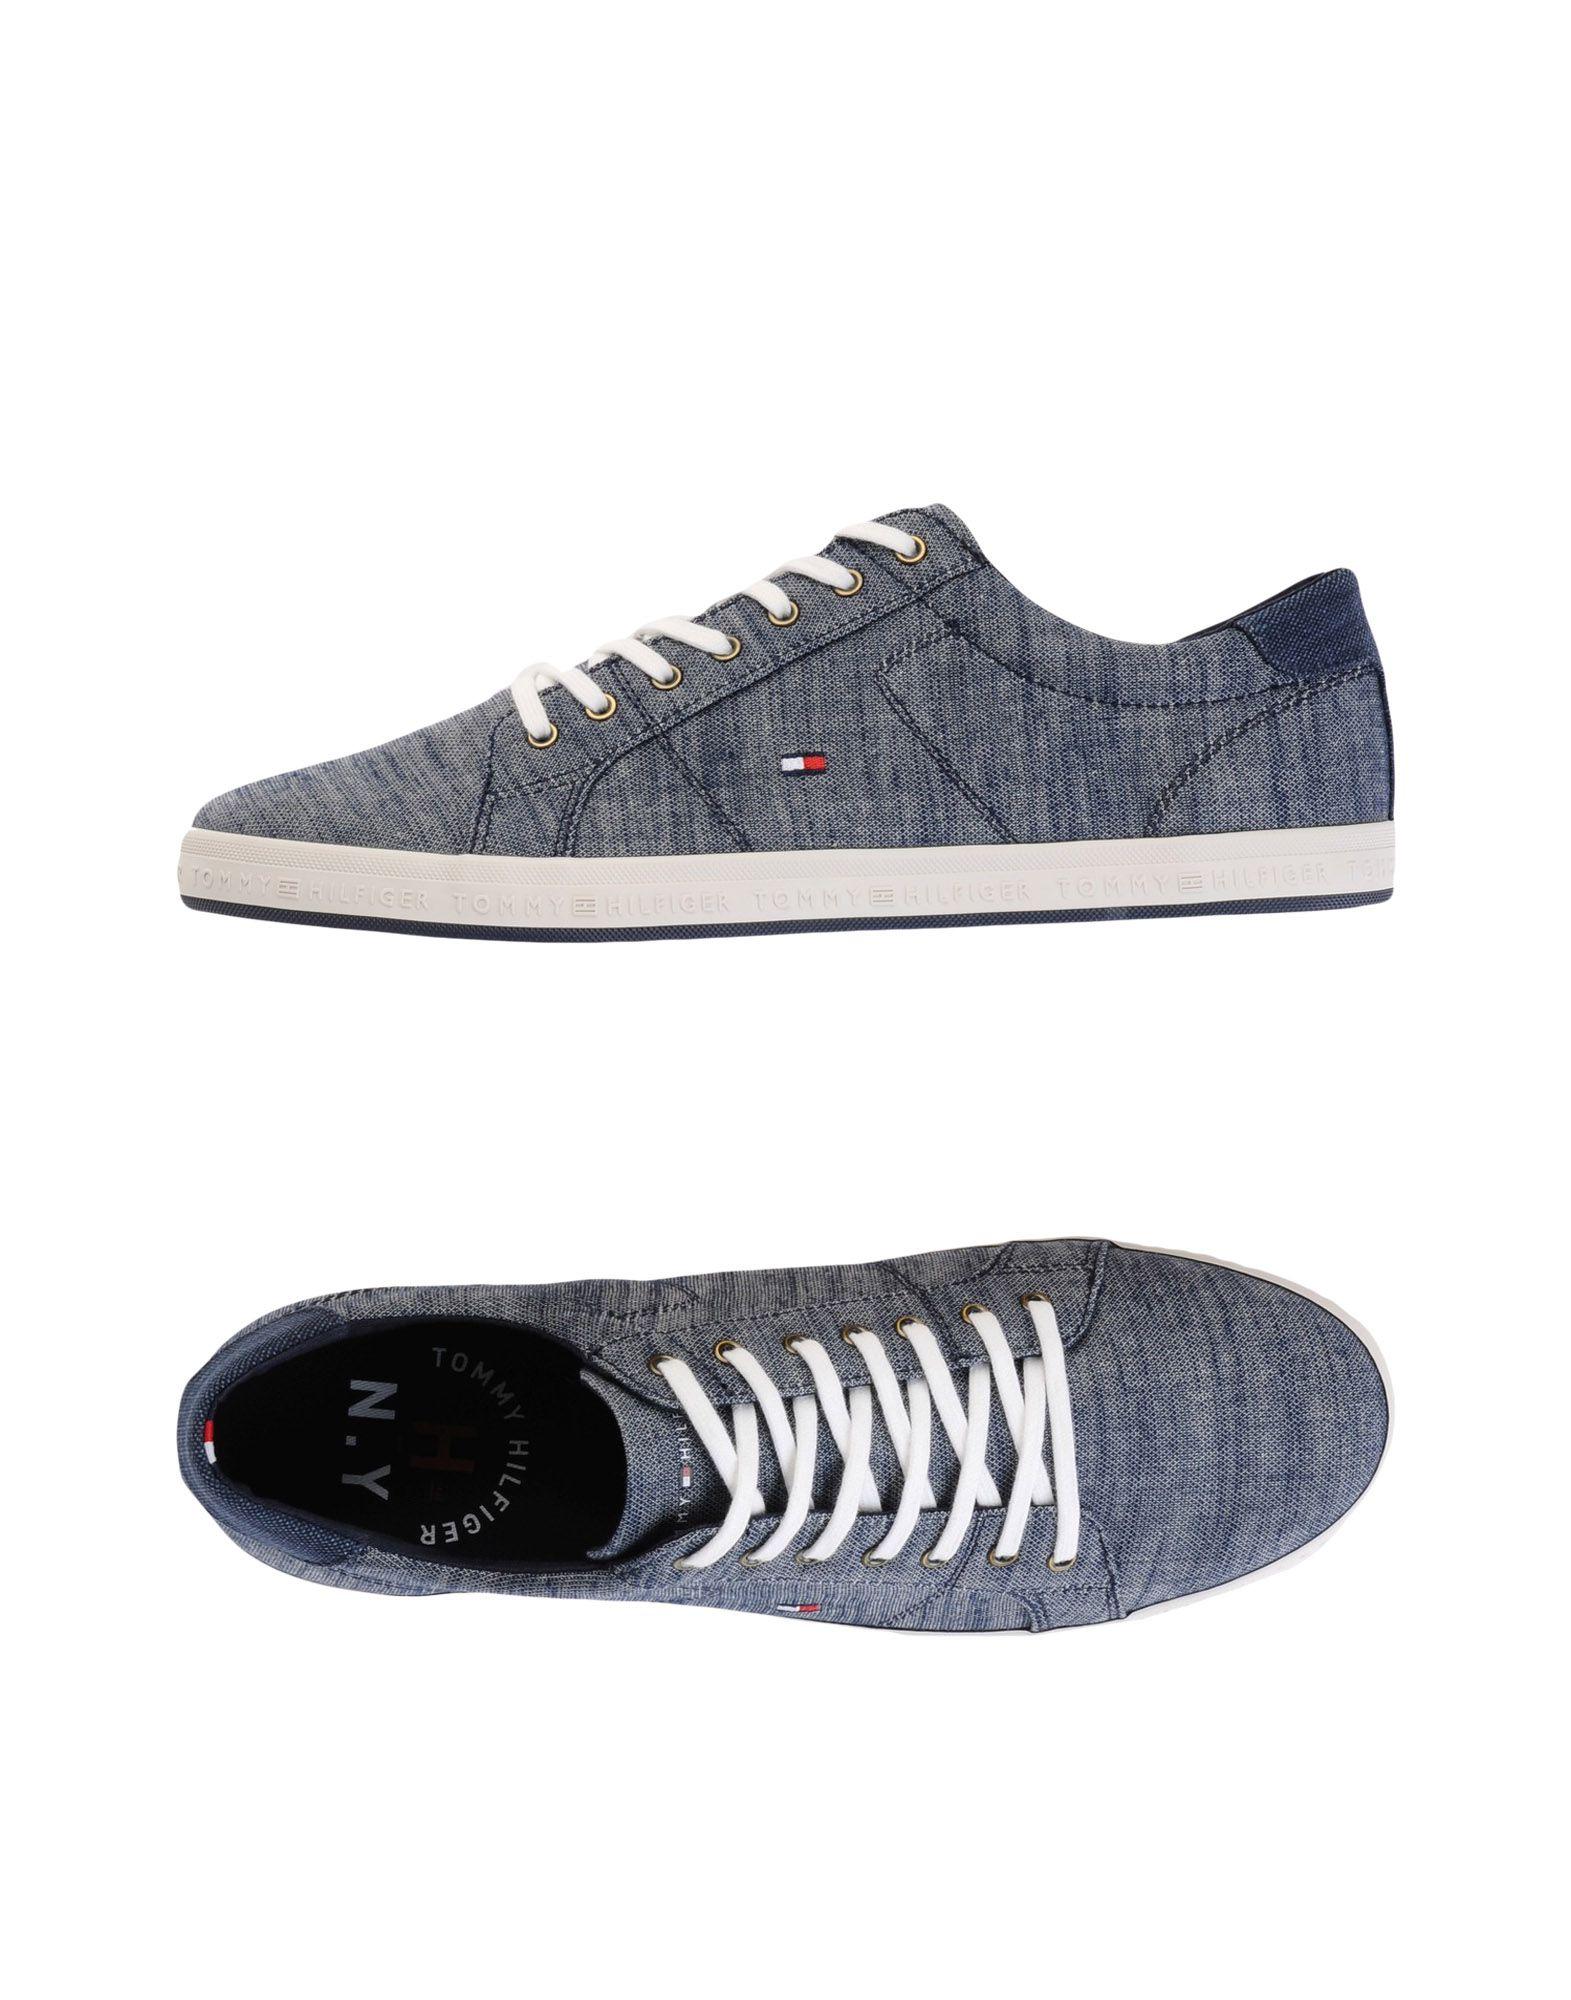 Sneakers Tommy Hilfiger Essential Pique Denim Sneaker - Uomo - 11471255MI